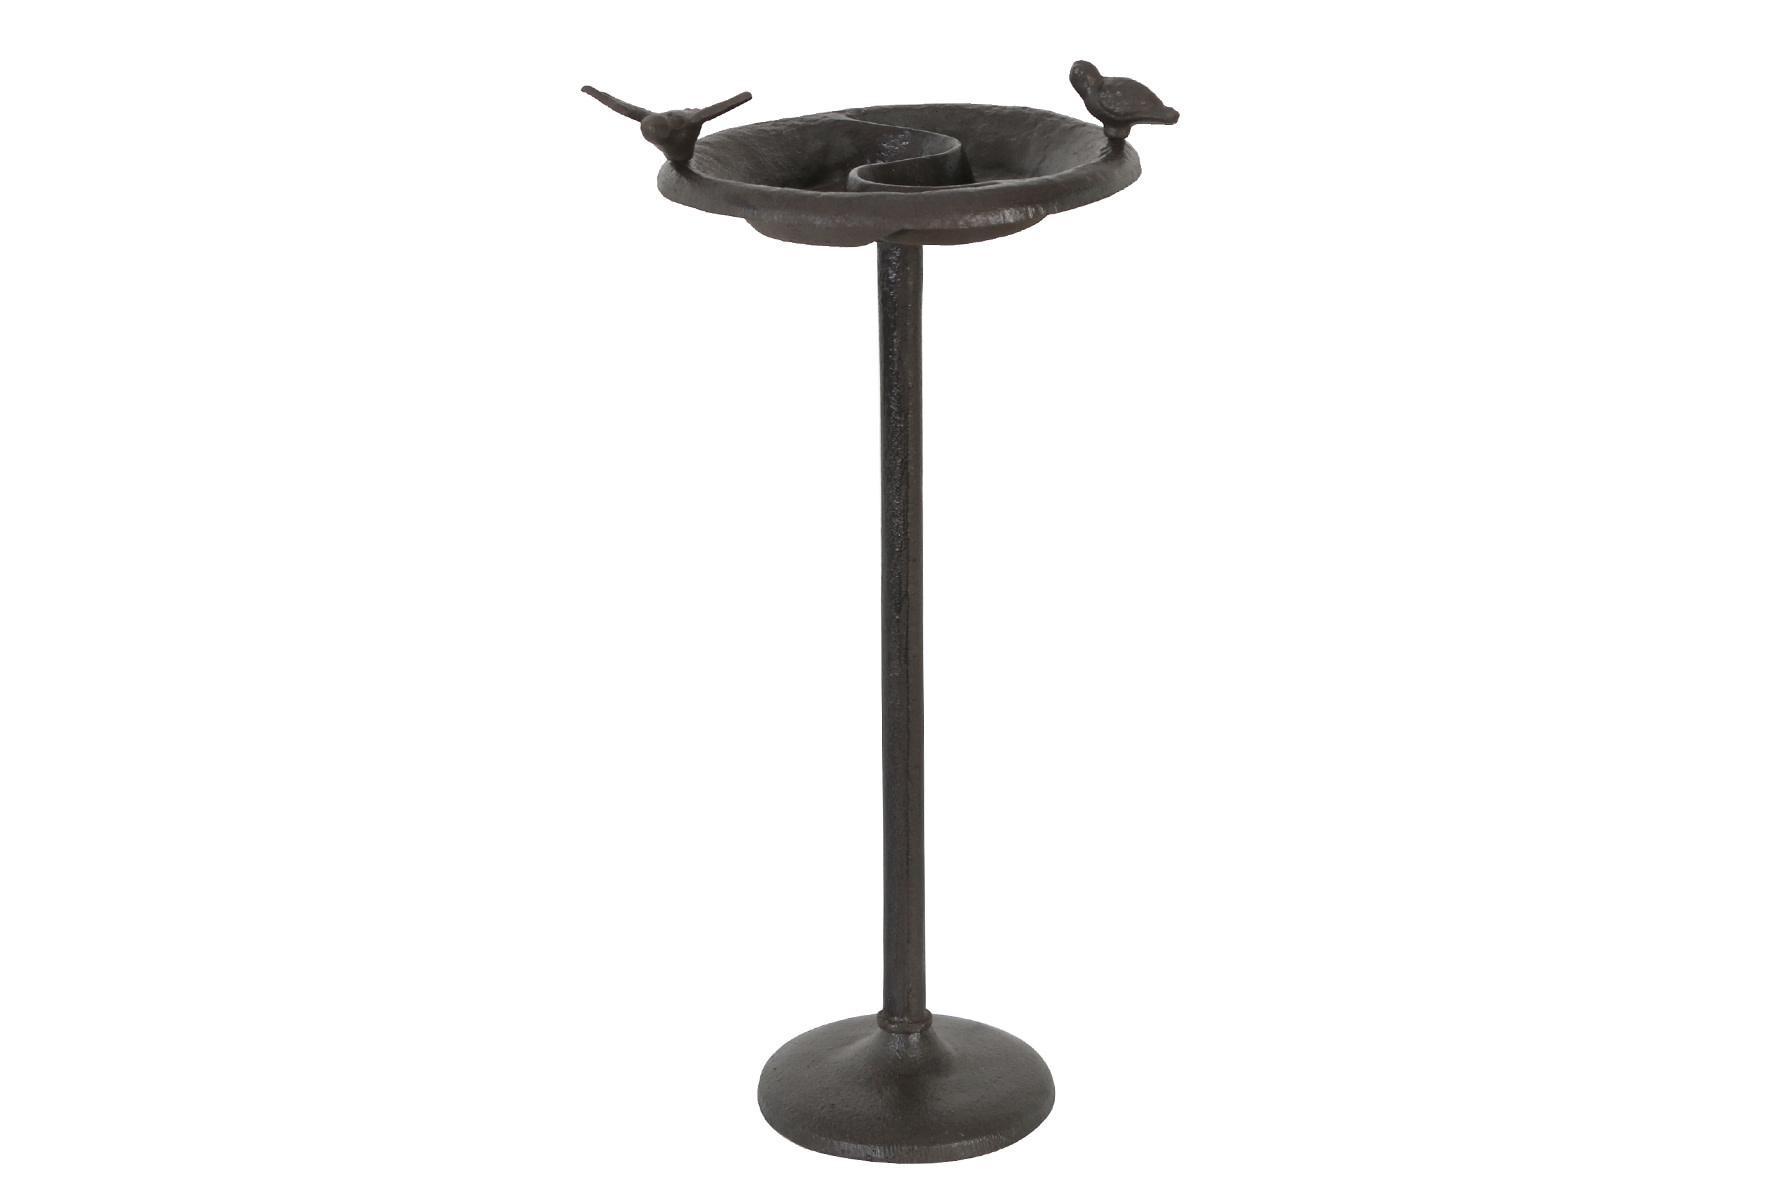 Dijk Bird Feeder Cast Iron 24.8x29.4x58.7cm